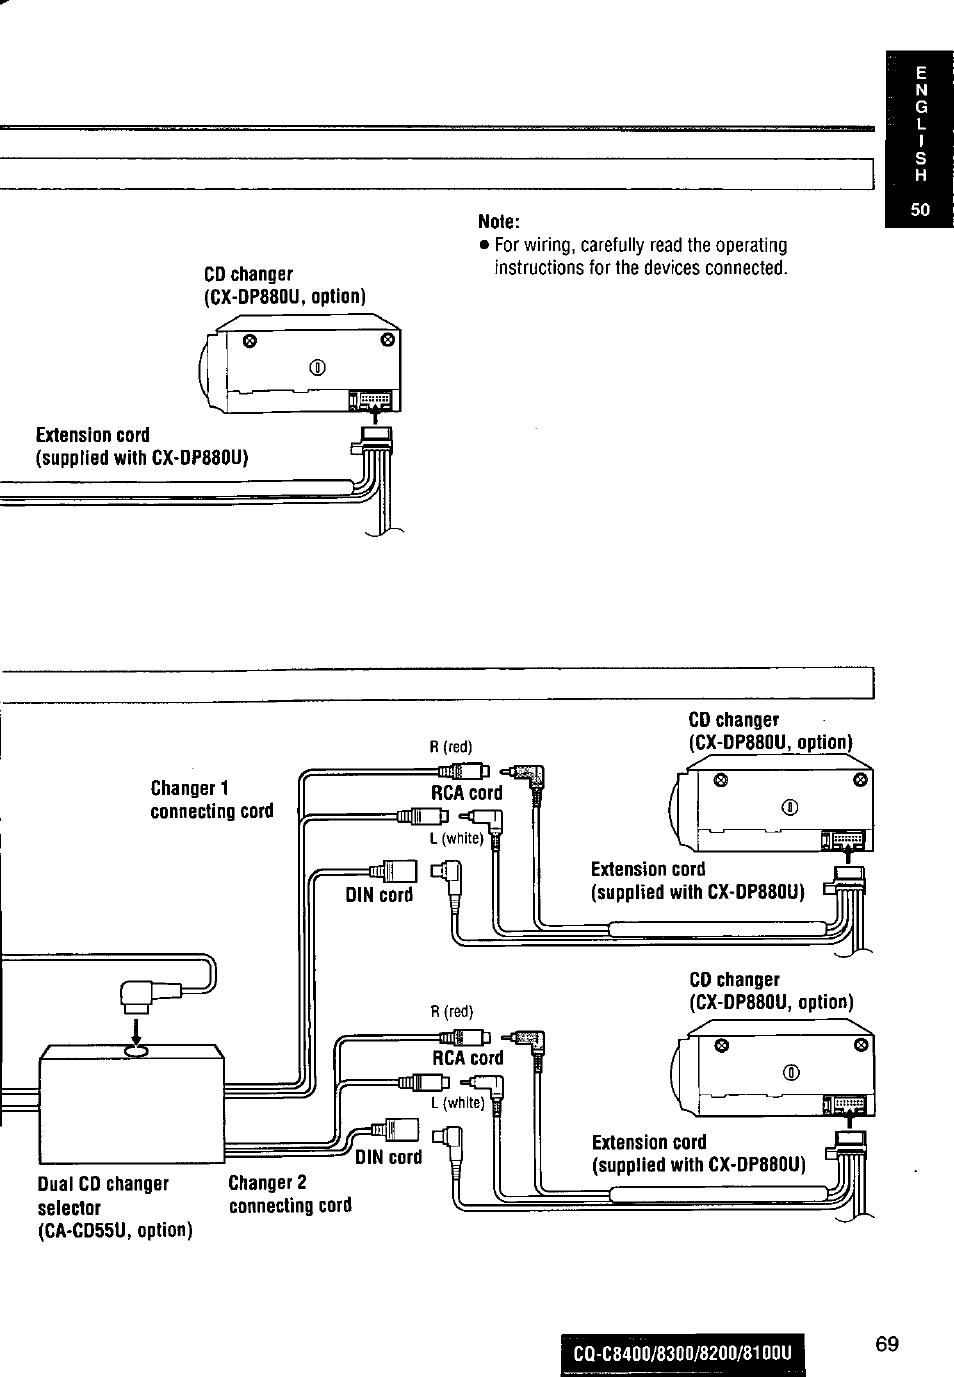 hight resolution of panasonic cq c8100u wiring diagram wiring librarypanasonic cq c8300u user manual page 69 176 also for